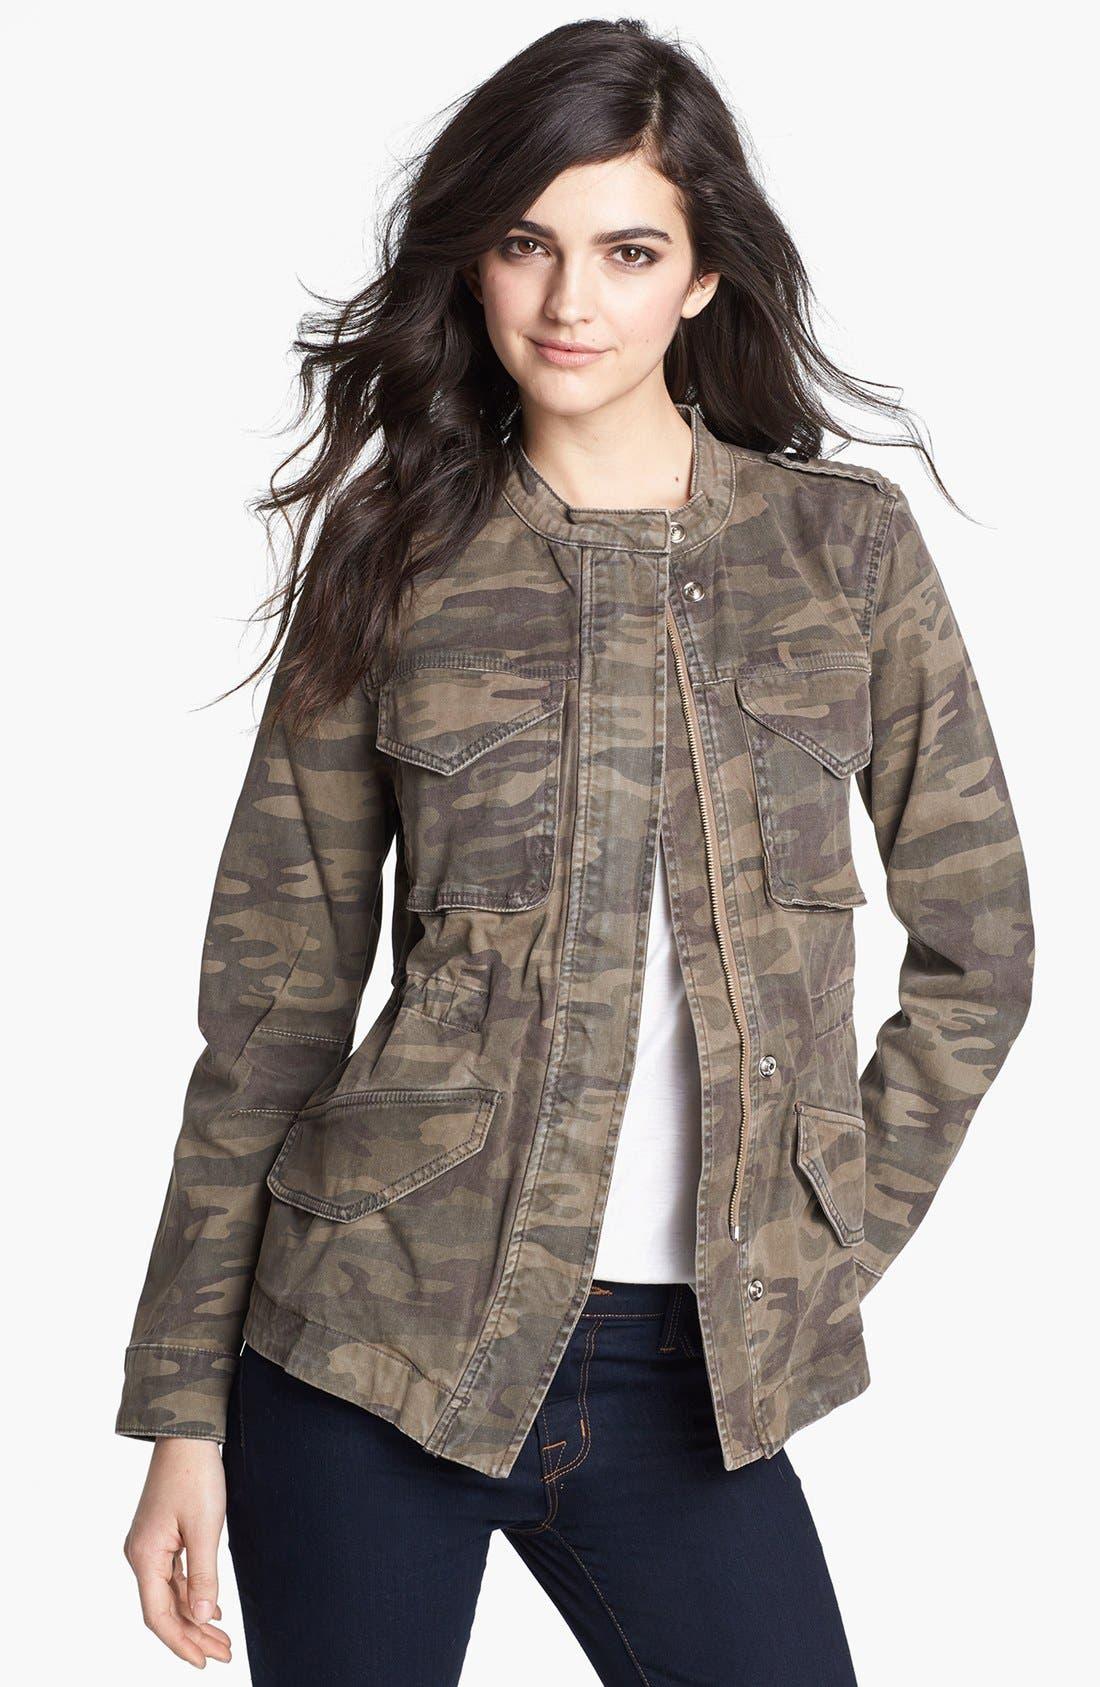 Alternate Image 1 Selected - Sanctuary Camouflage Print Jacket